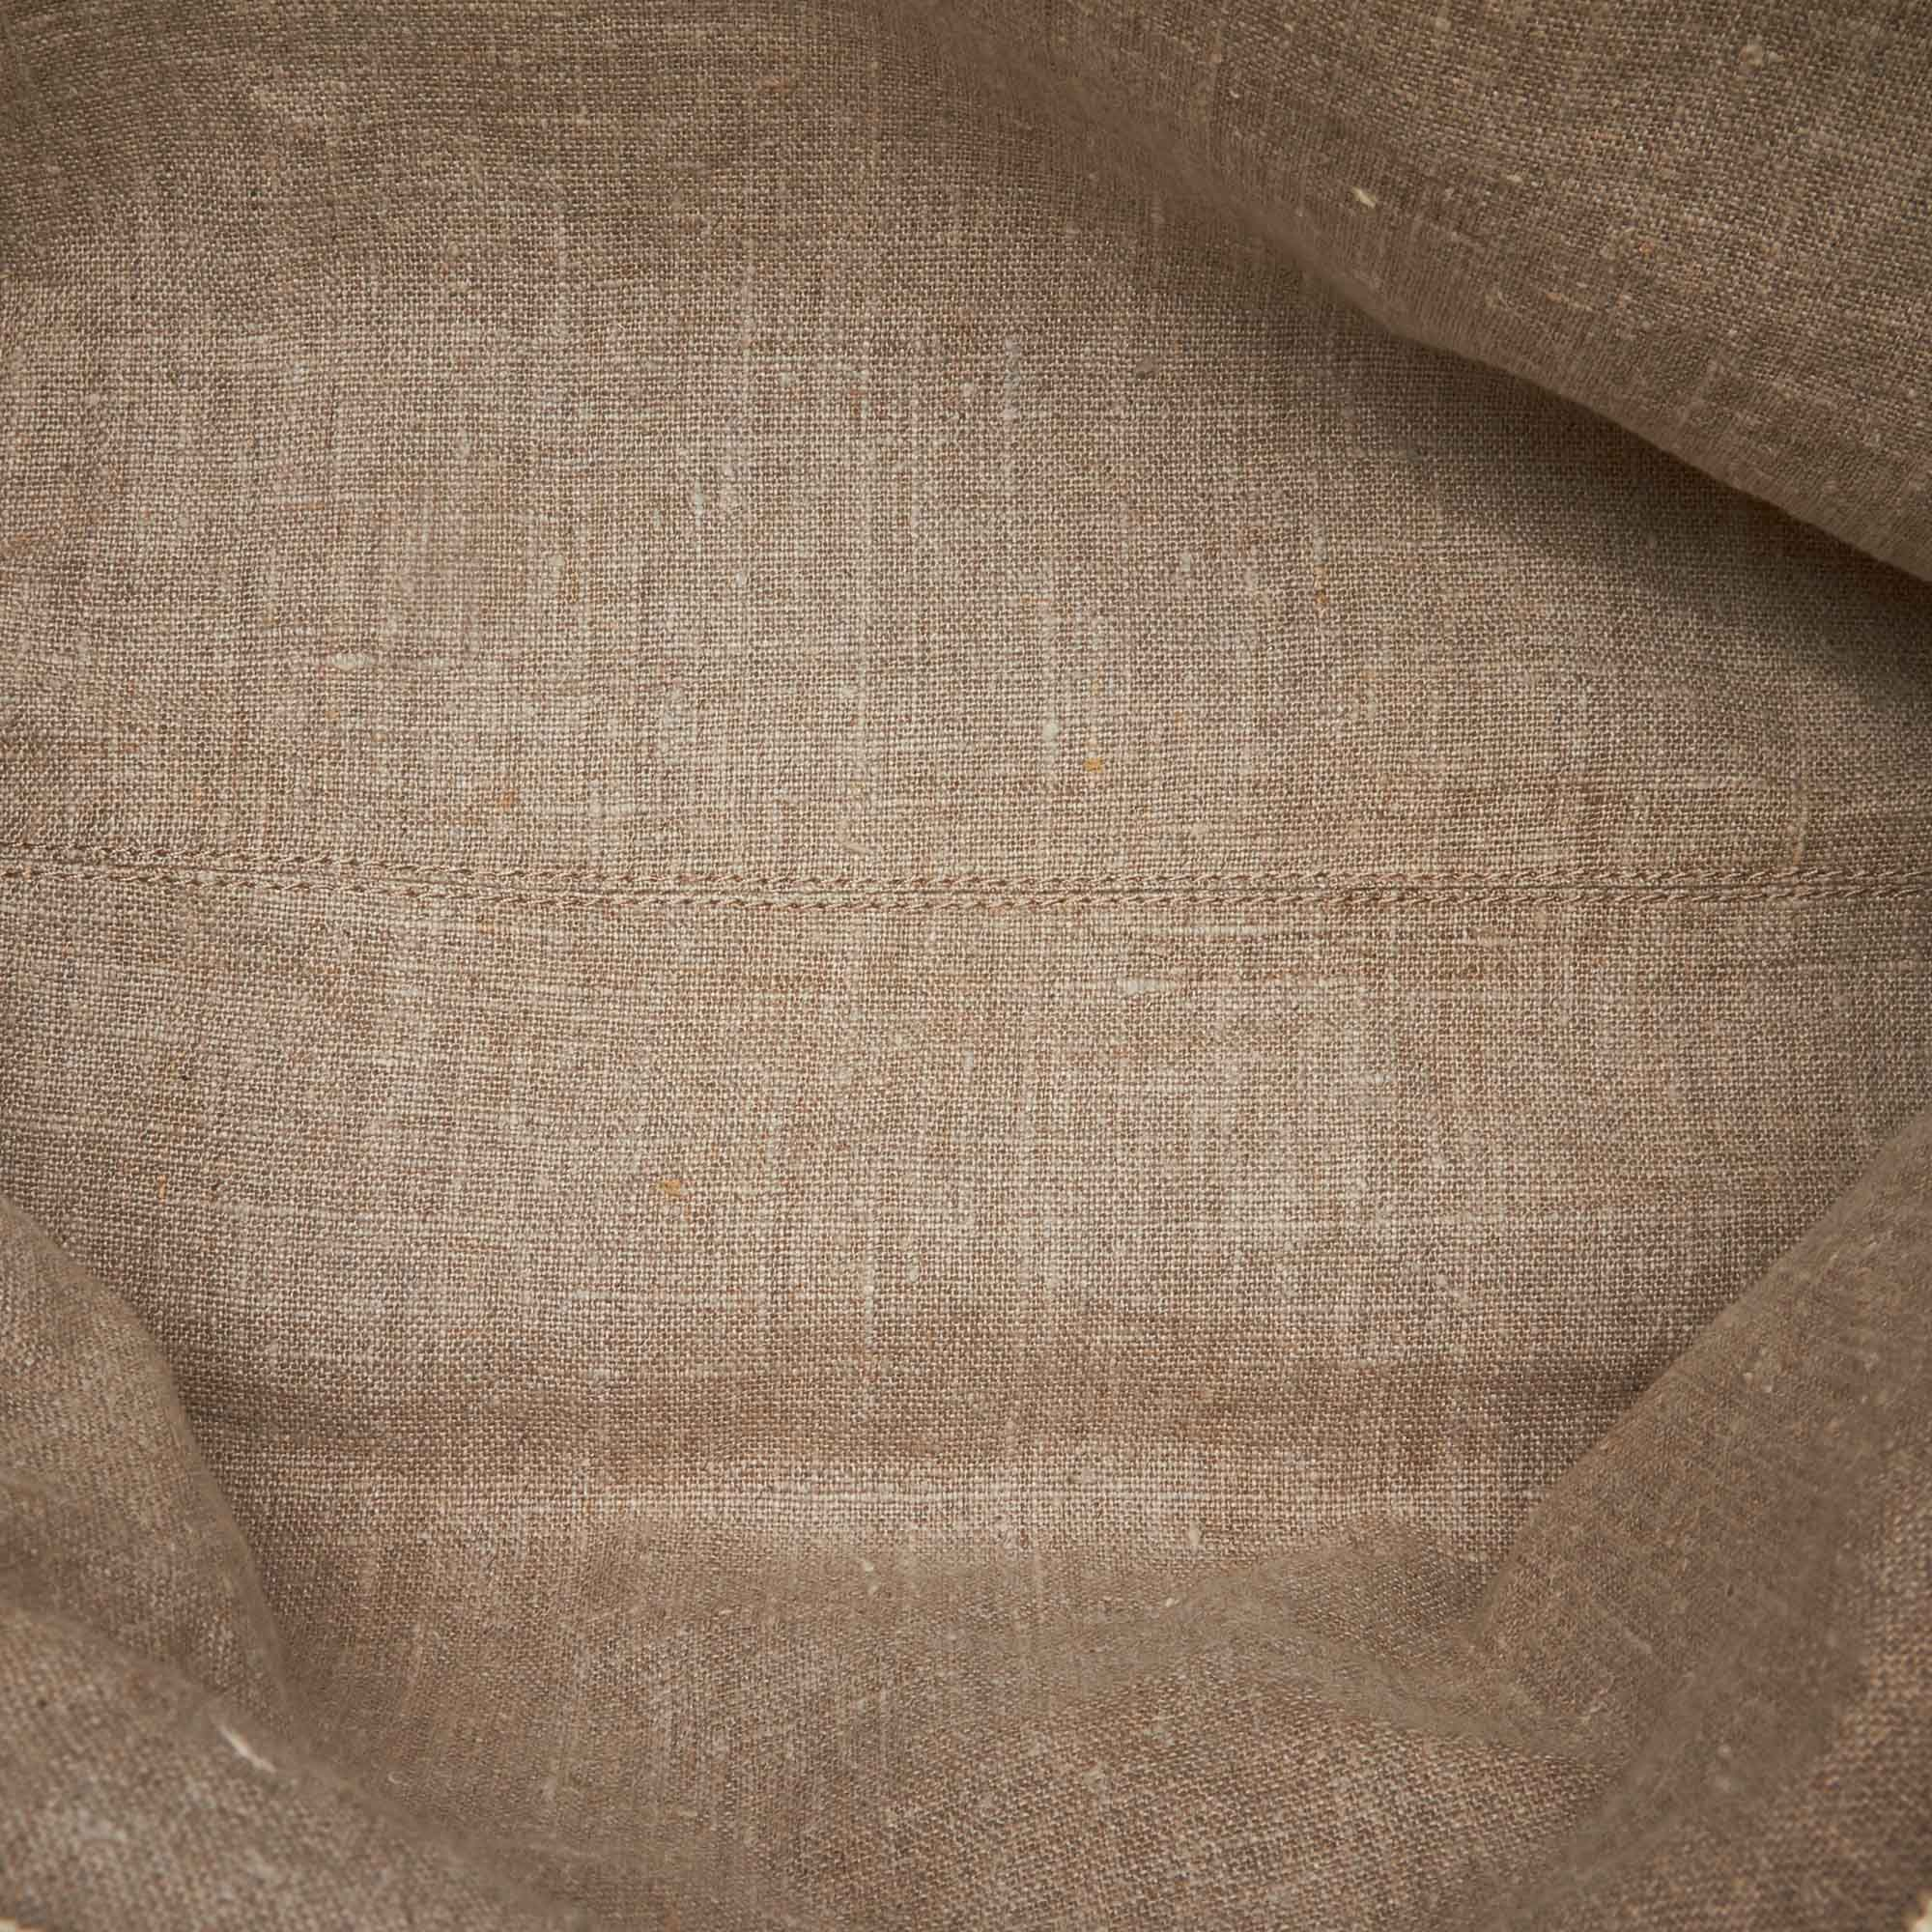 Vintage Fendi Striped Hemp Tote Brown